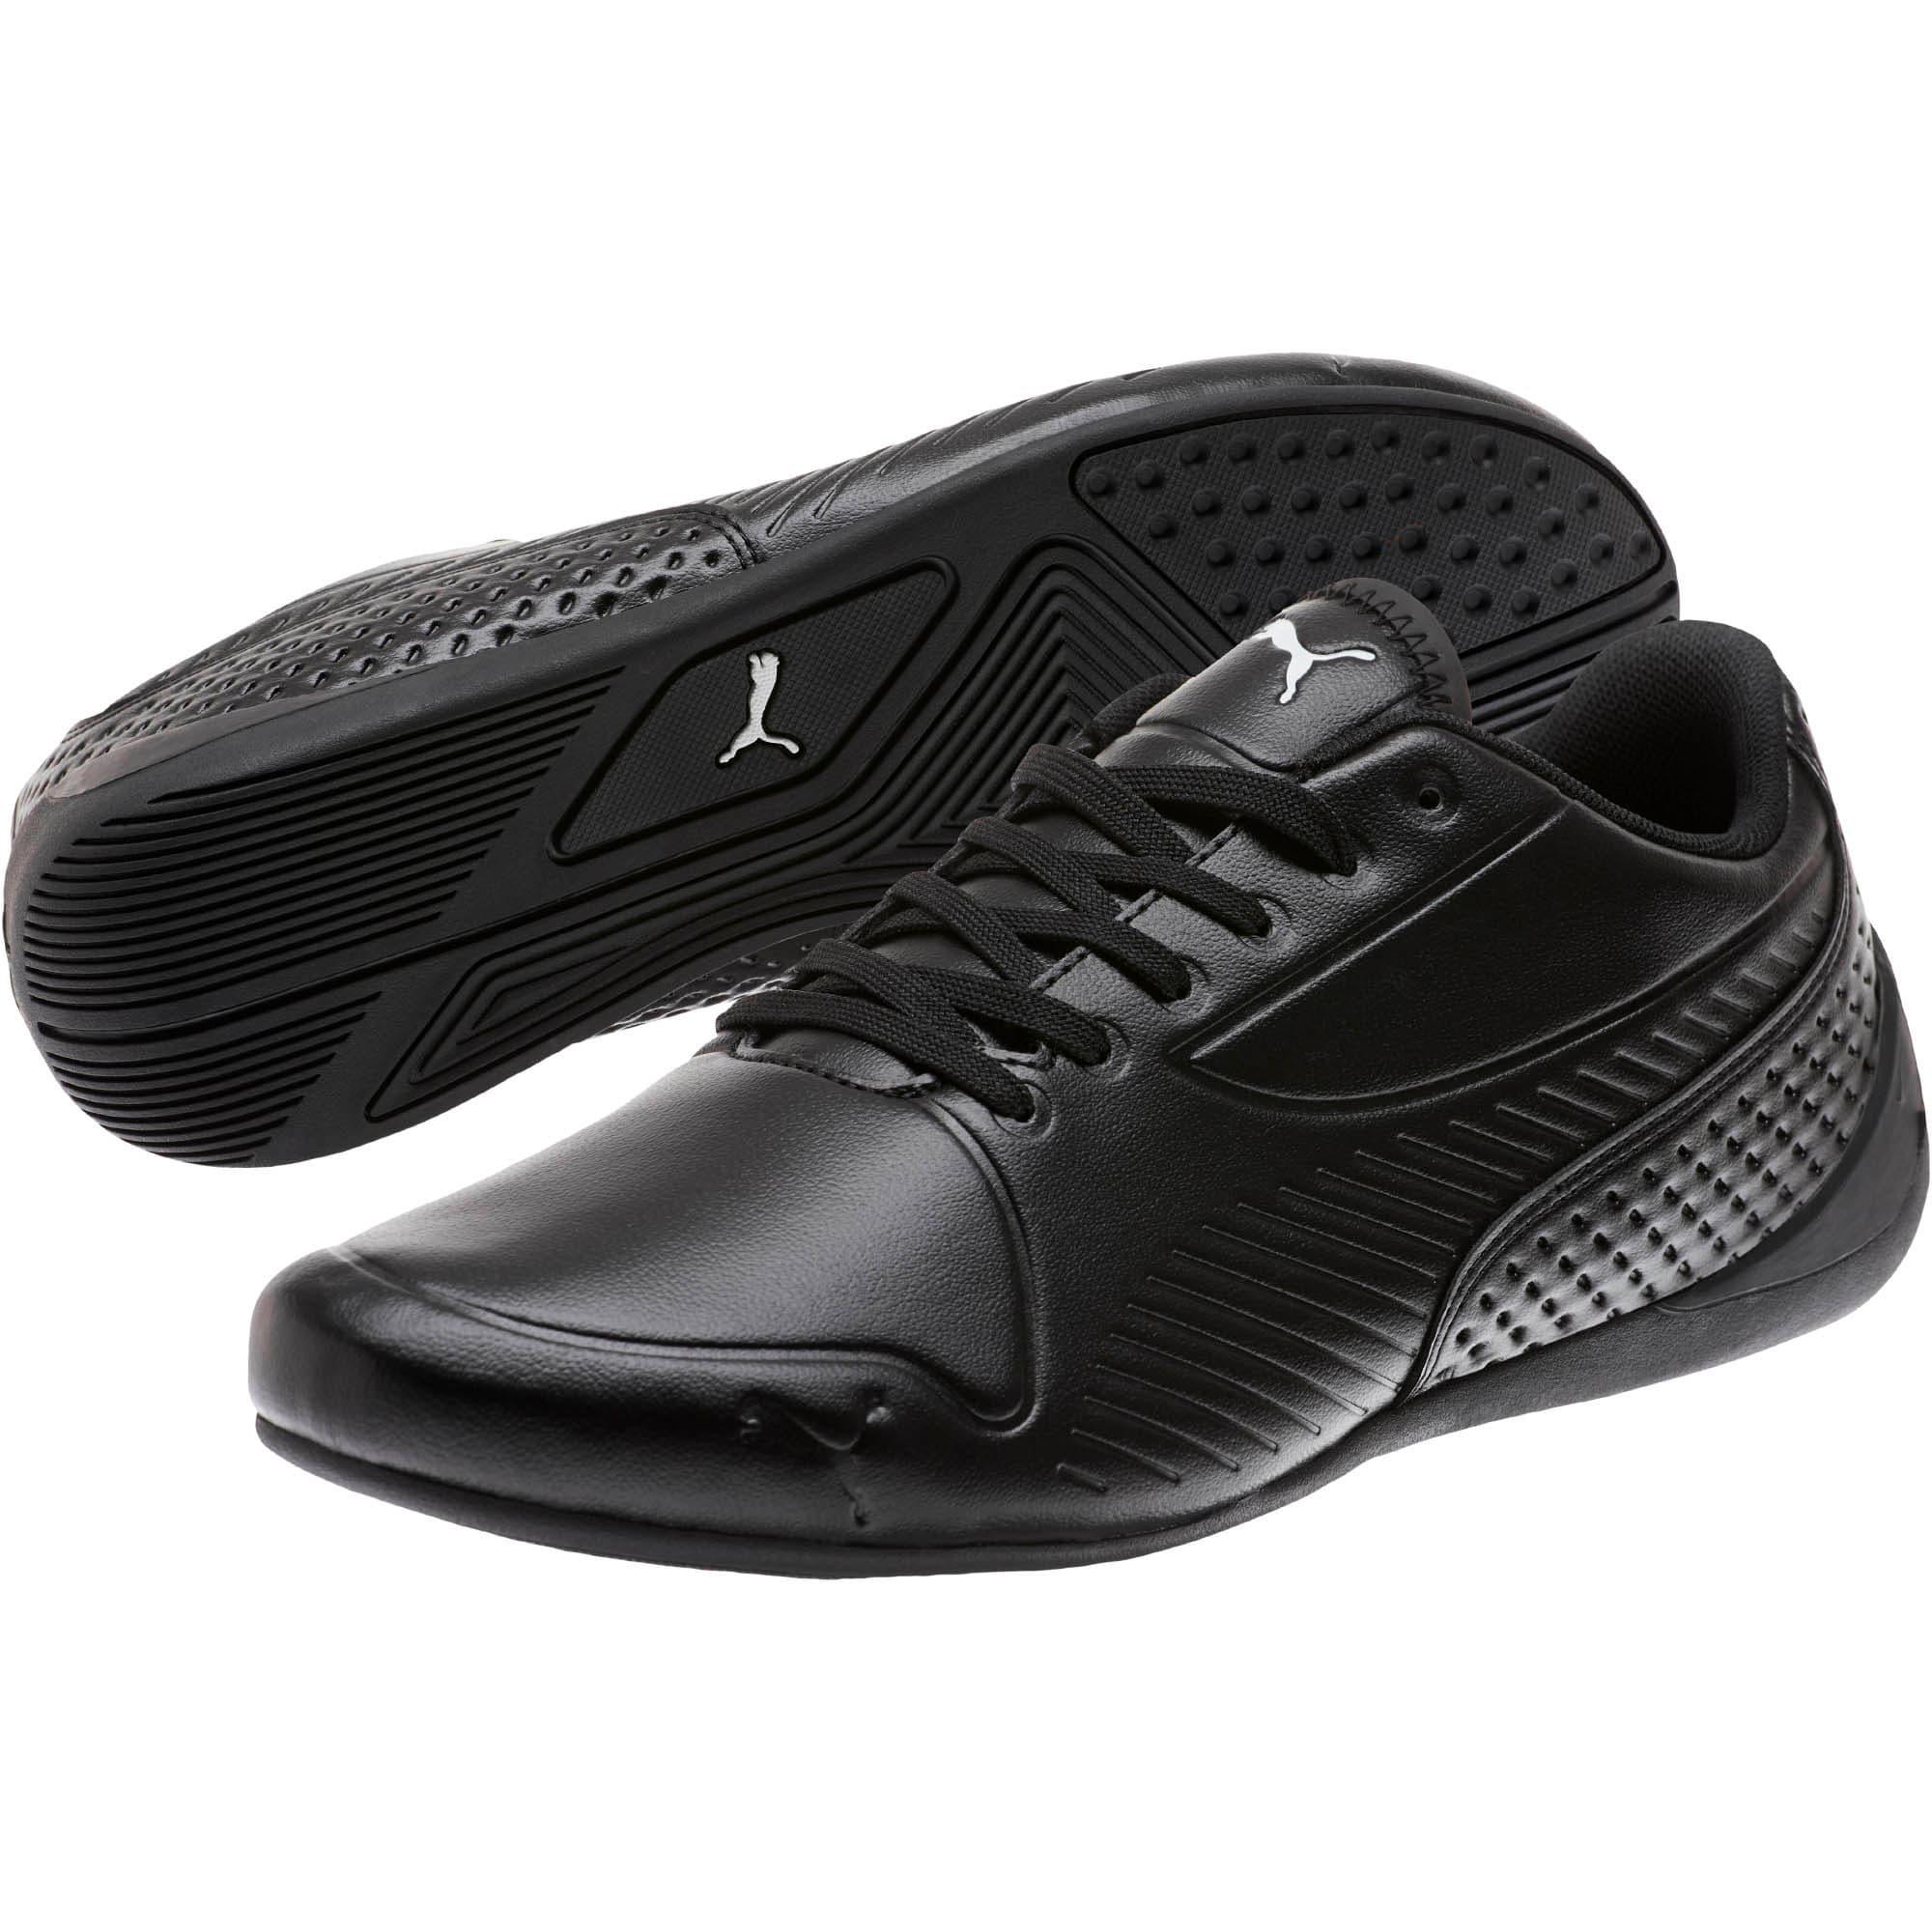 Thumbnail 2 of Drift Cat 7S Ultra Shoes, Puma Black-Puma Black, medium